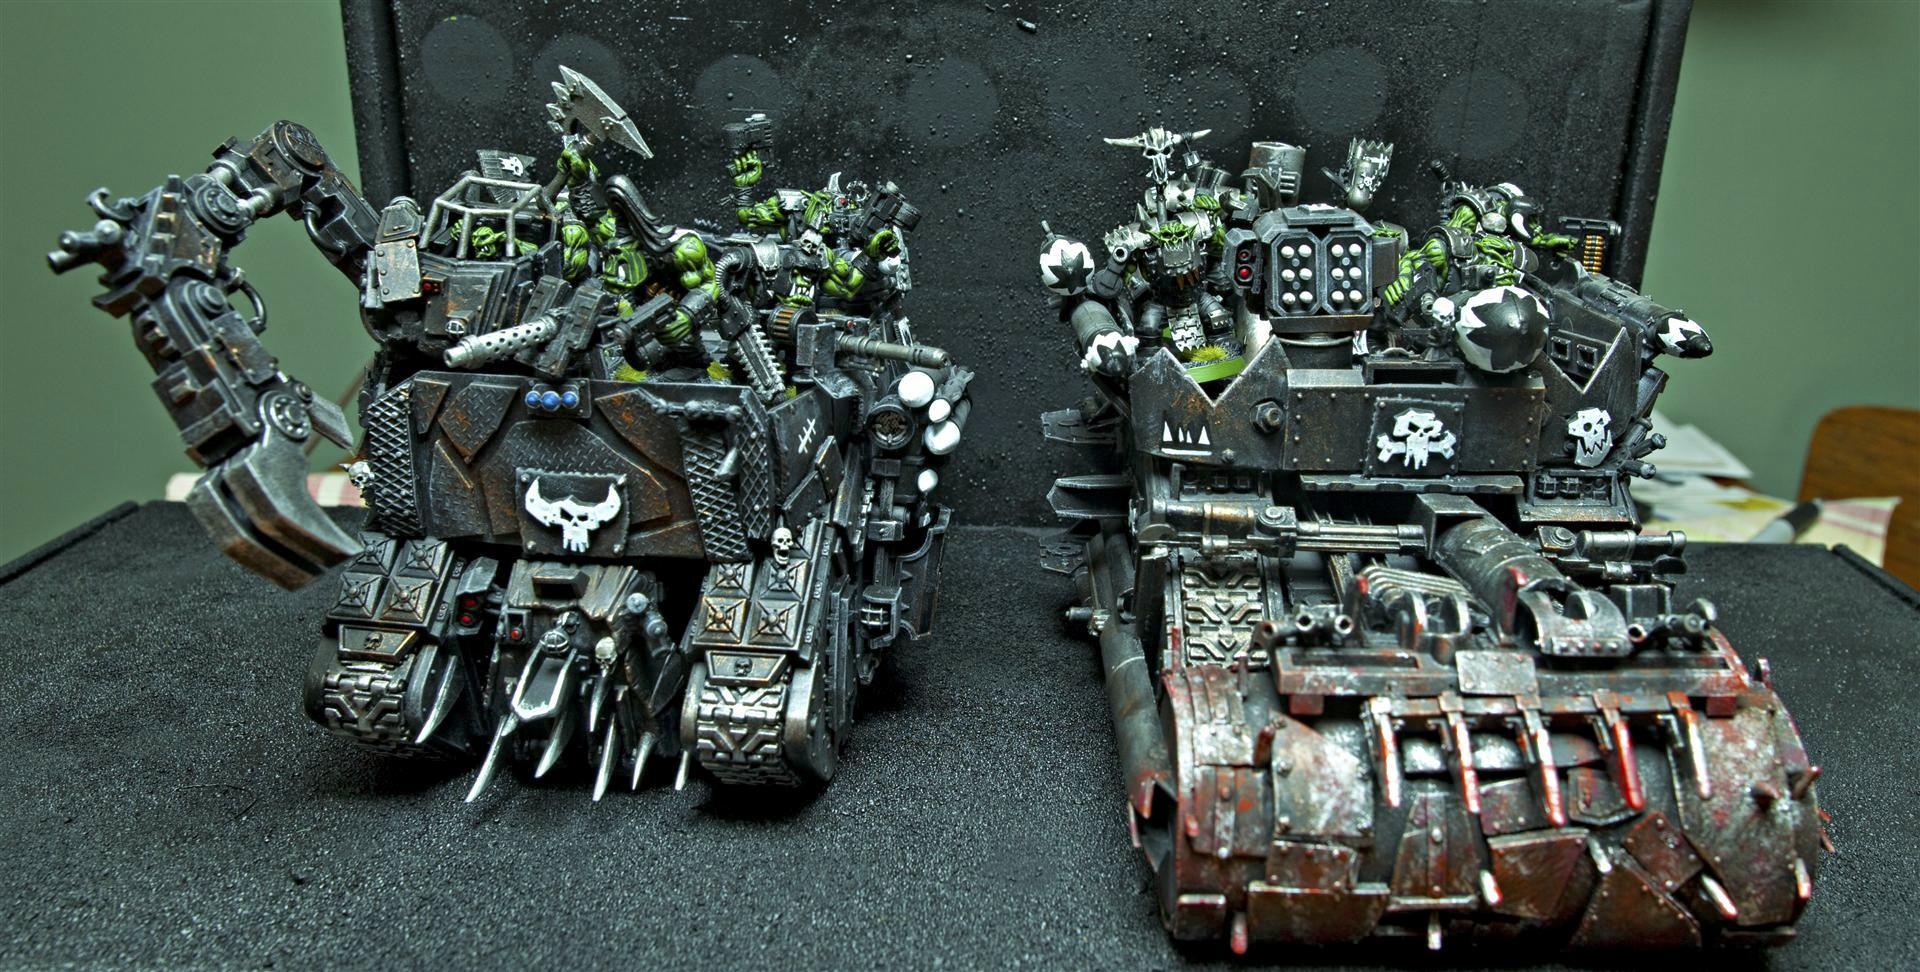 Battlewagon, Deffrolla, Goff, Goffs, Grabbin Klaw, Nob, Orks, Painboy